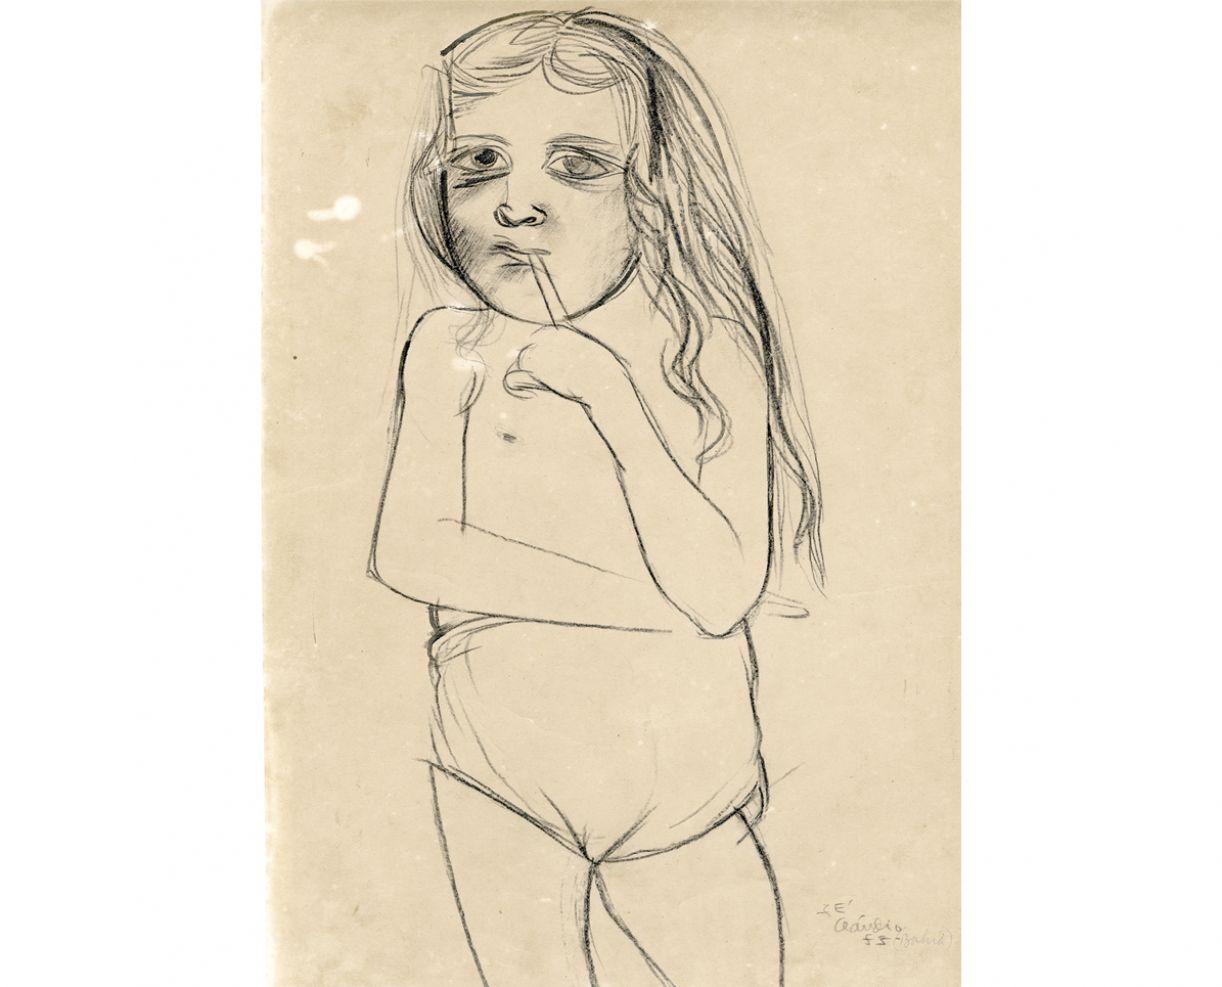 Desenho a lápis conté sobre papel canson, 32 x 46,5 cm, Bahia, 1955